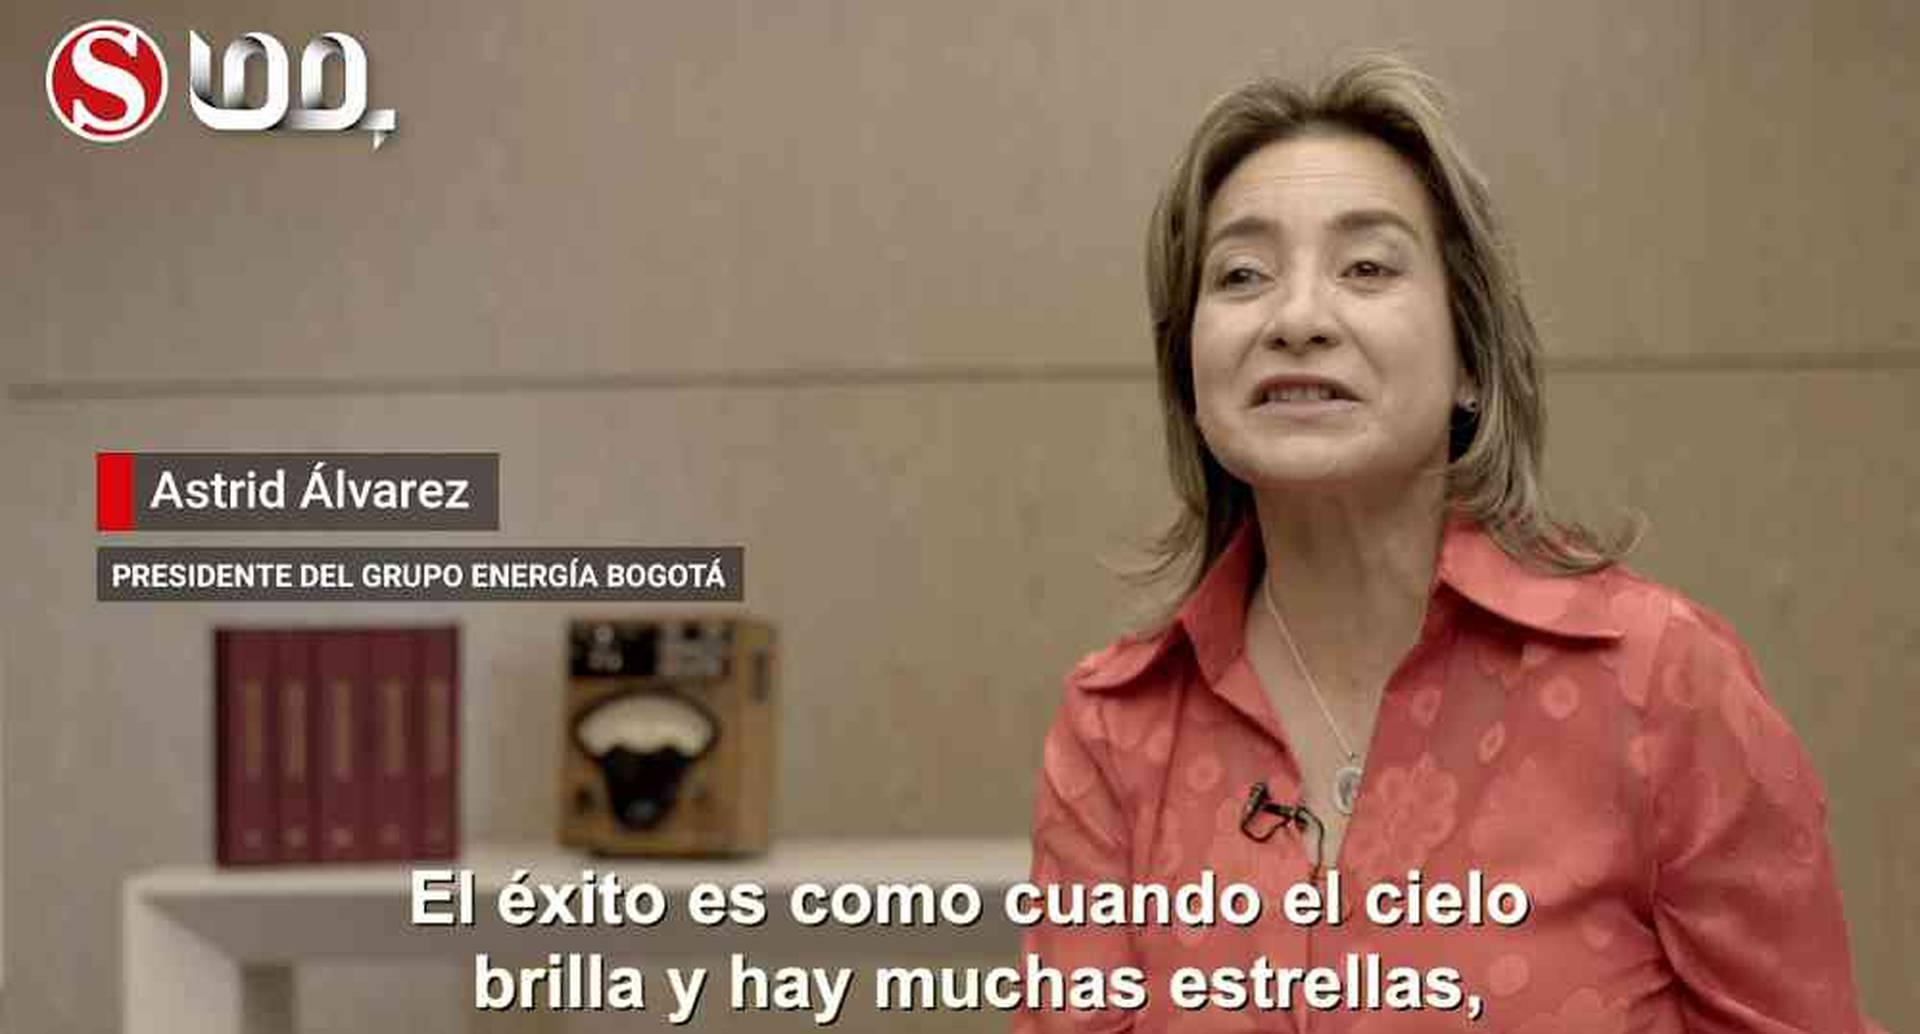 Astrid Álvarez, presidenta del Grupo Energía de Bogotá.